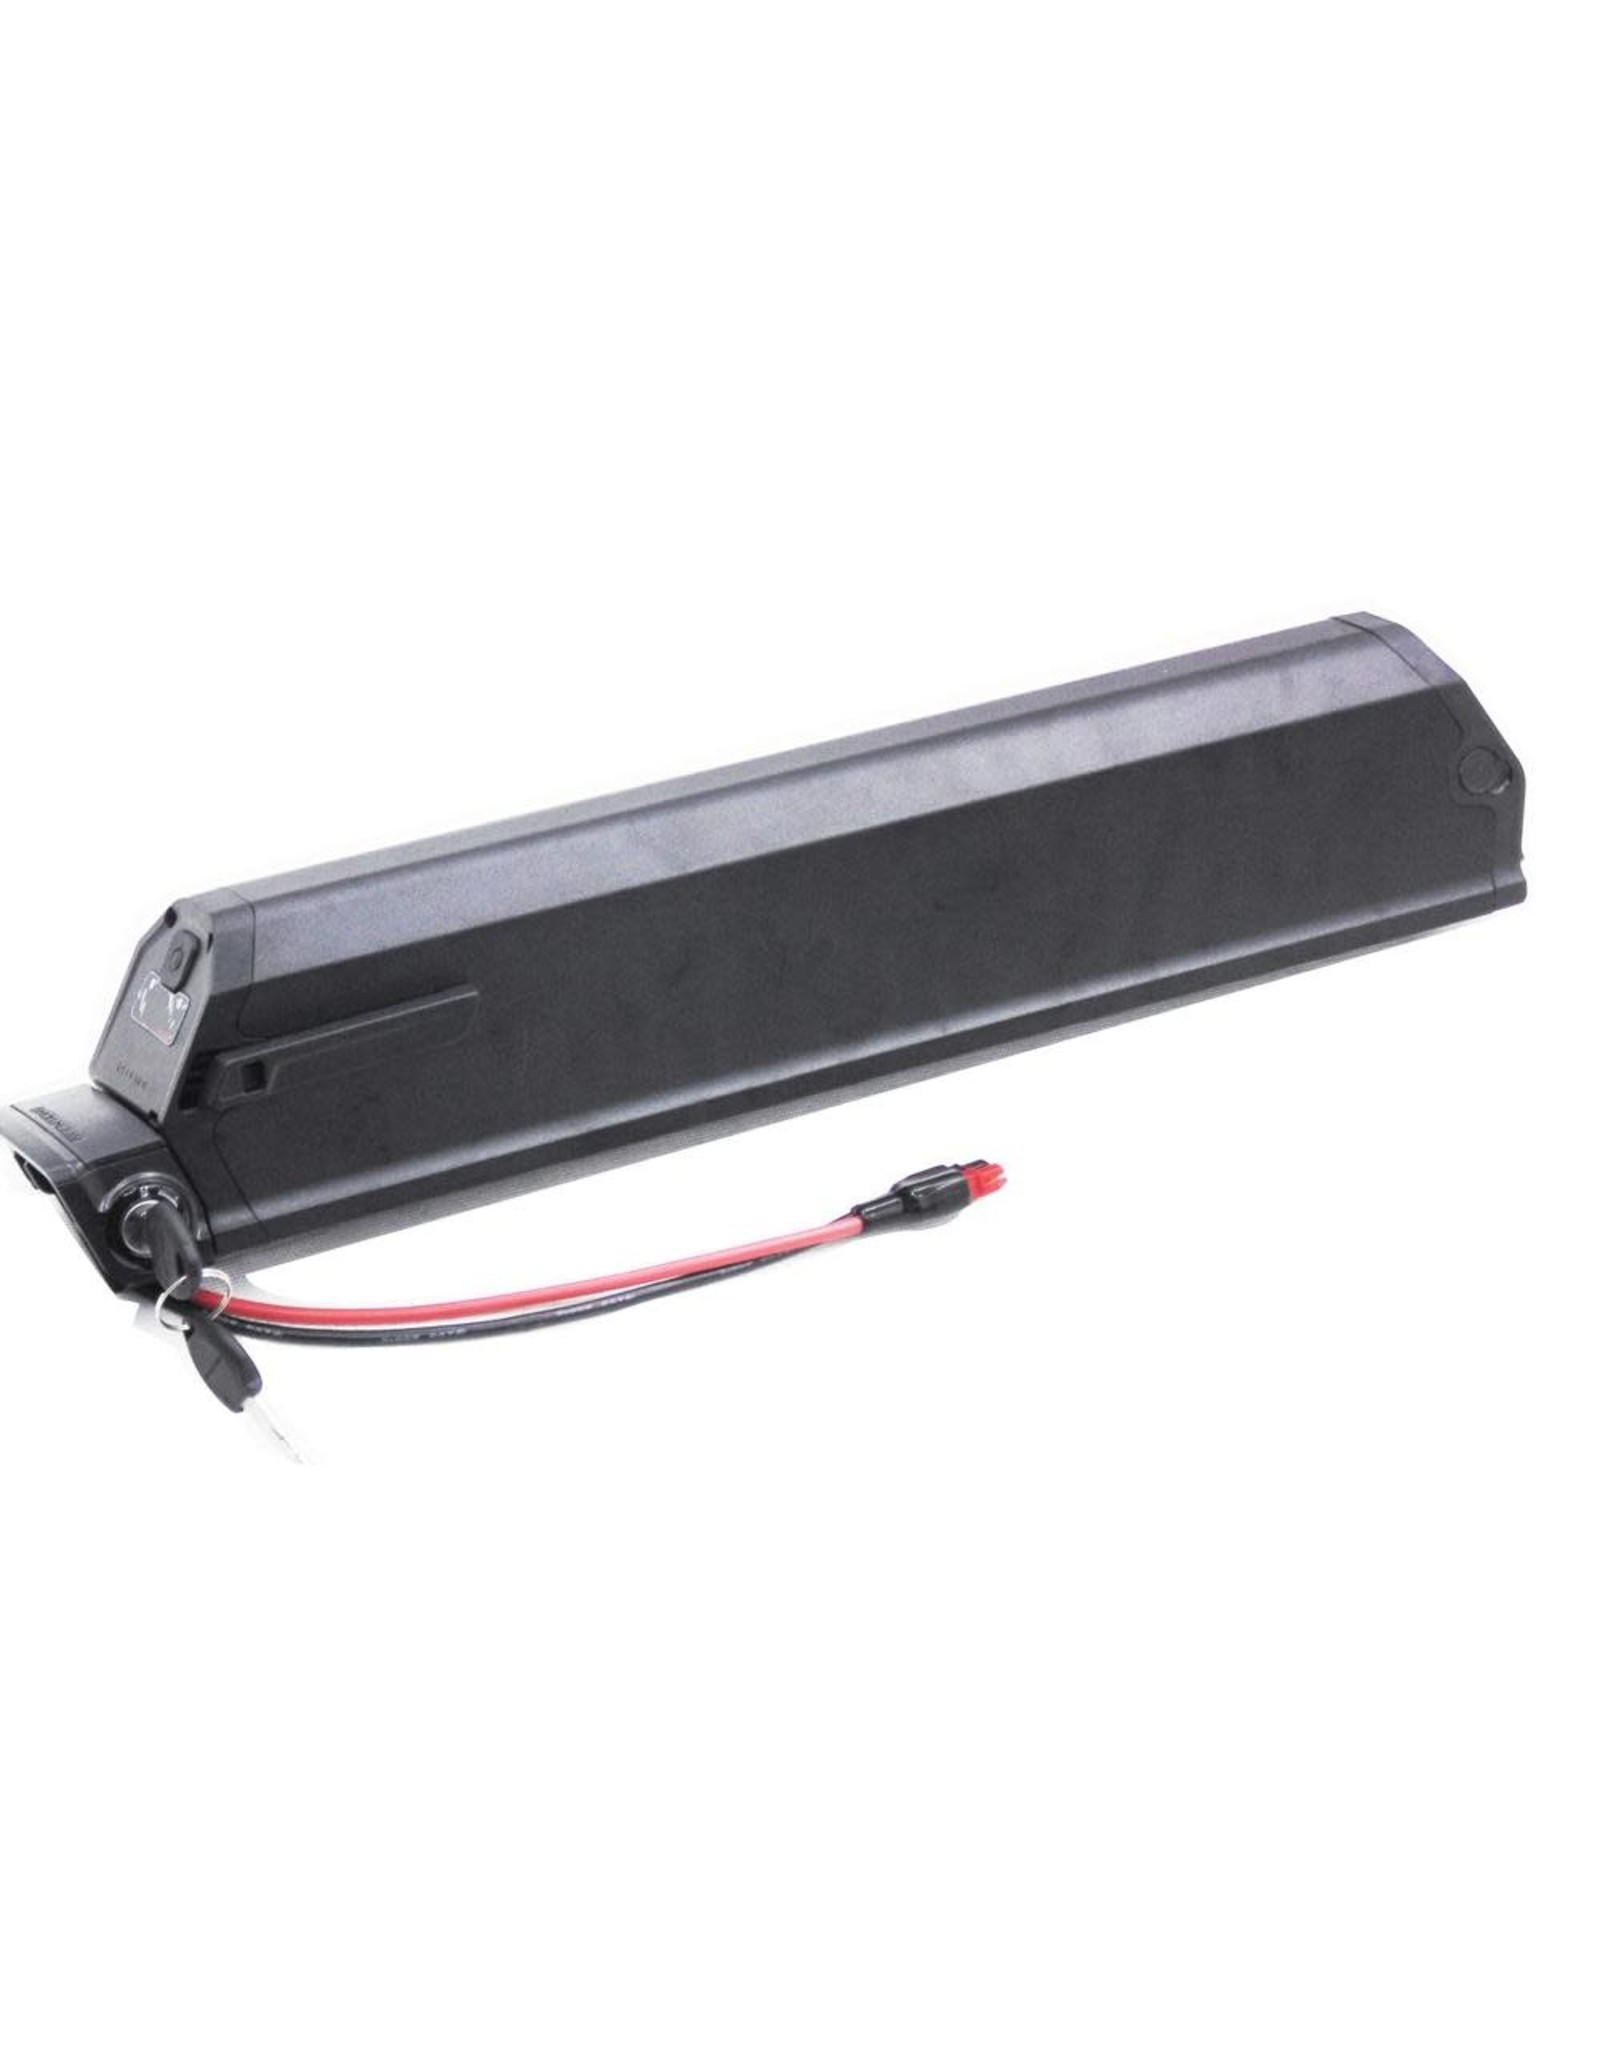 Dorado Pro36V 11.6Ah  417Wh  battery for E-bike black